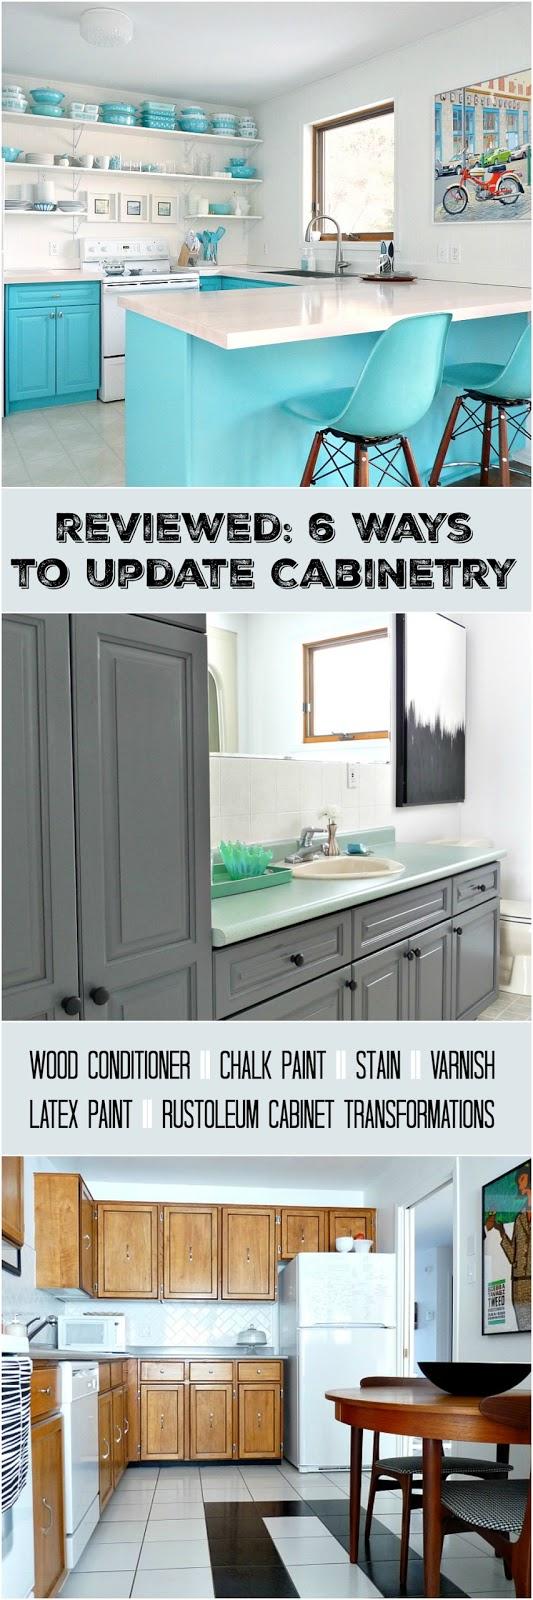 Cabinet Refinishing 101 Latex Paint Vs Stain Vs Rust